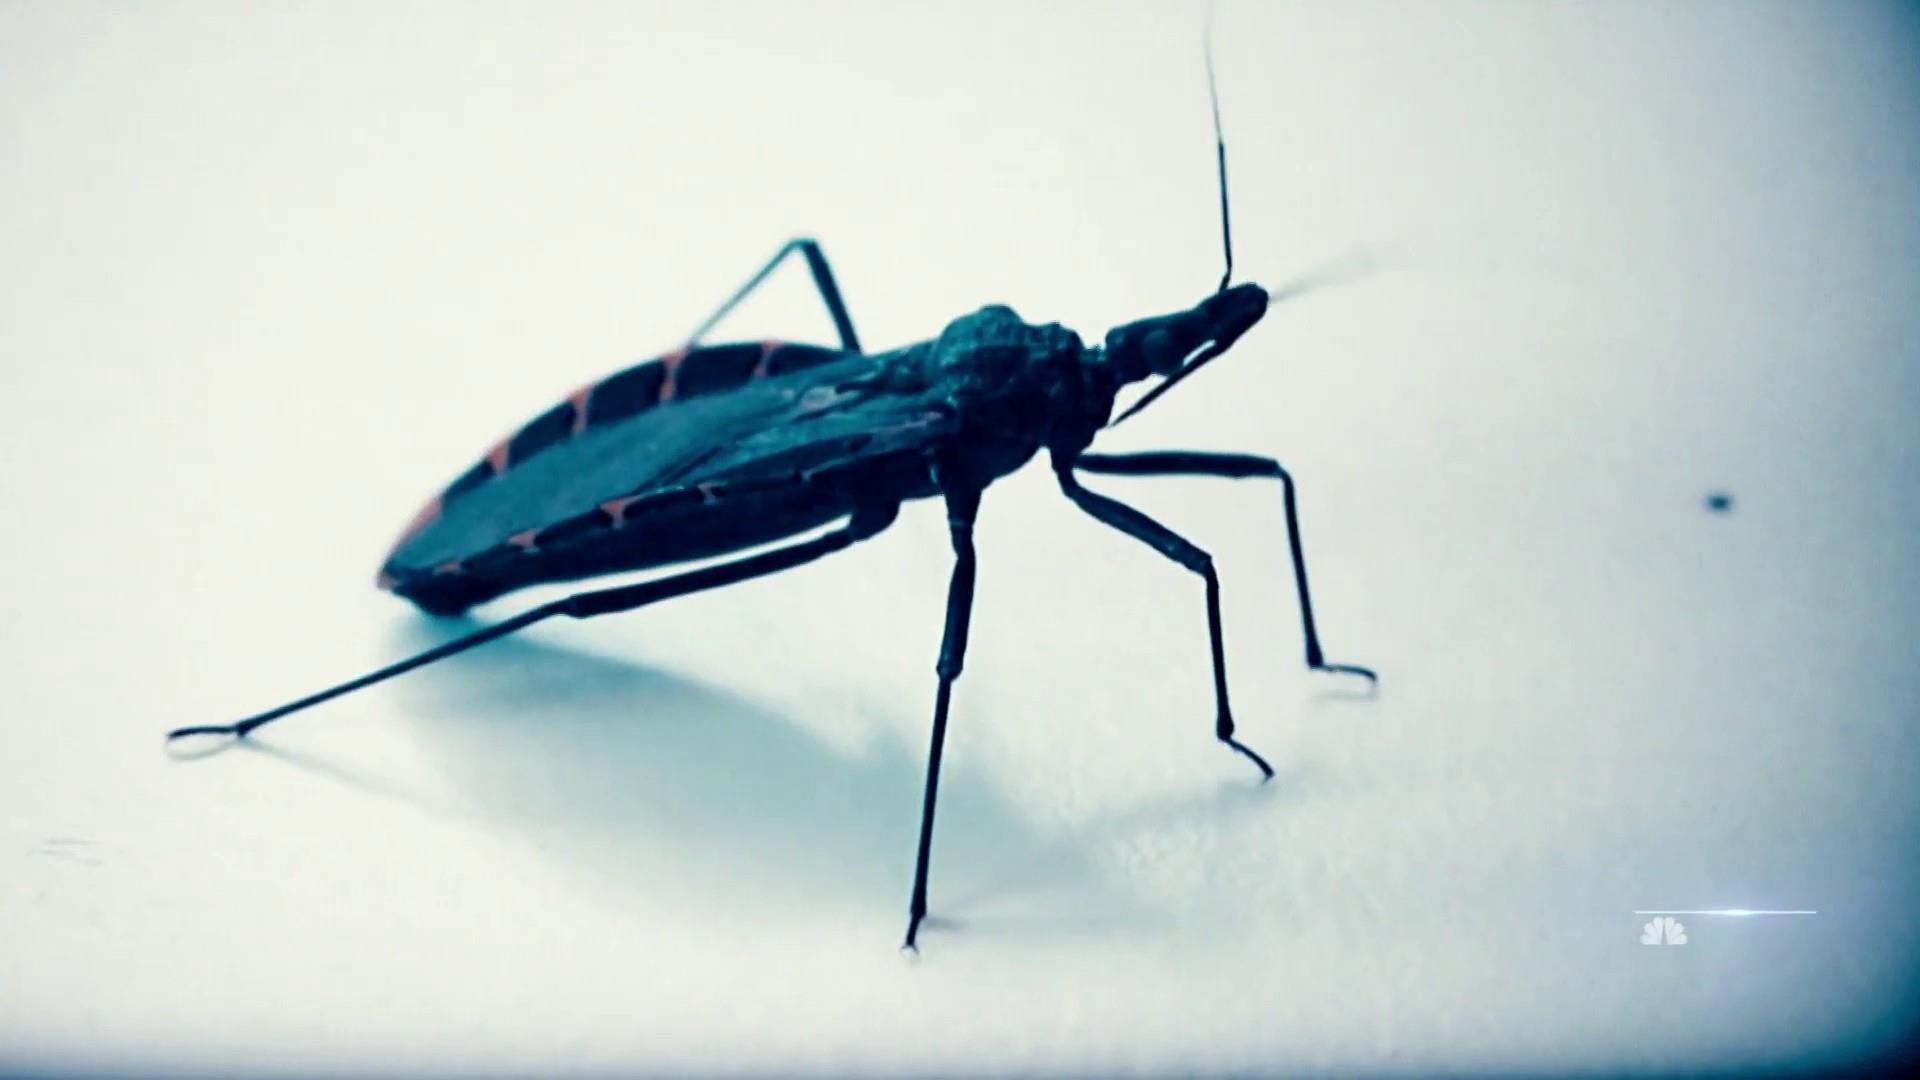 flipboard health officials warn deadly kissing bugs spreading north in u s. Black Bedroom Furniture Sets. Home Design Ideas